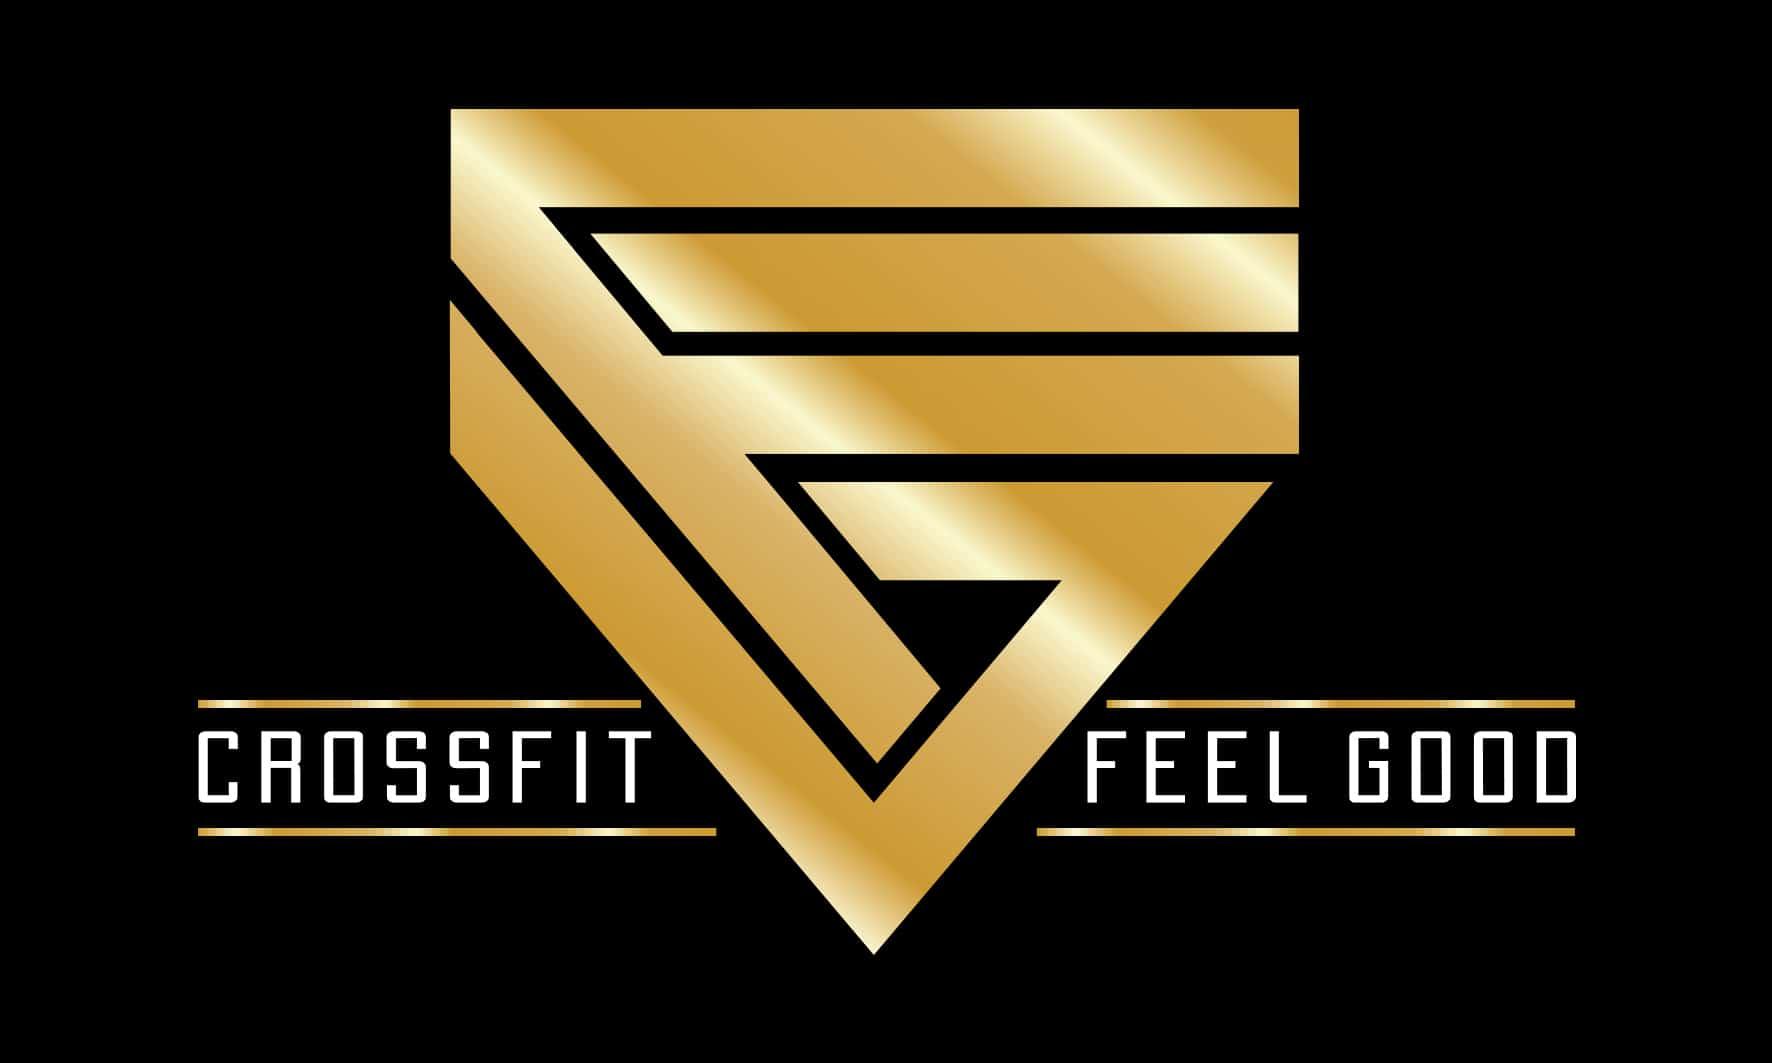 CrossFit Feel Good